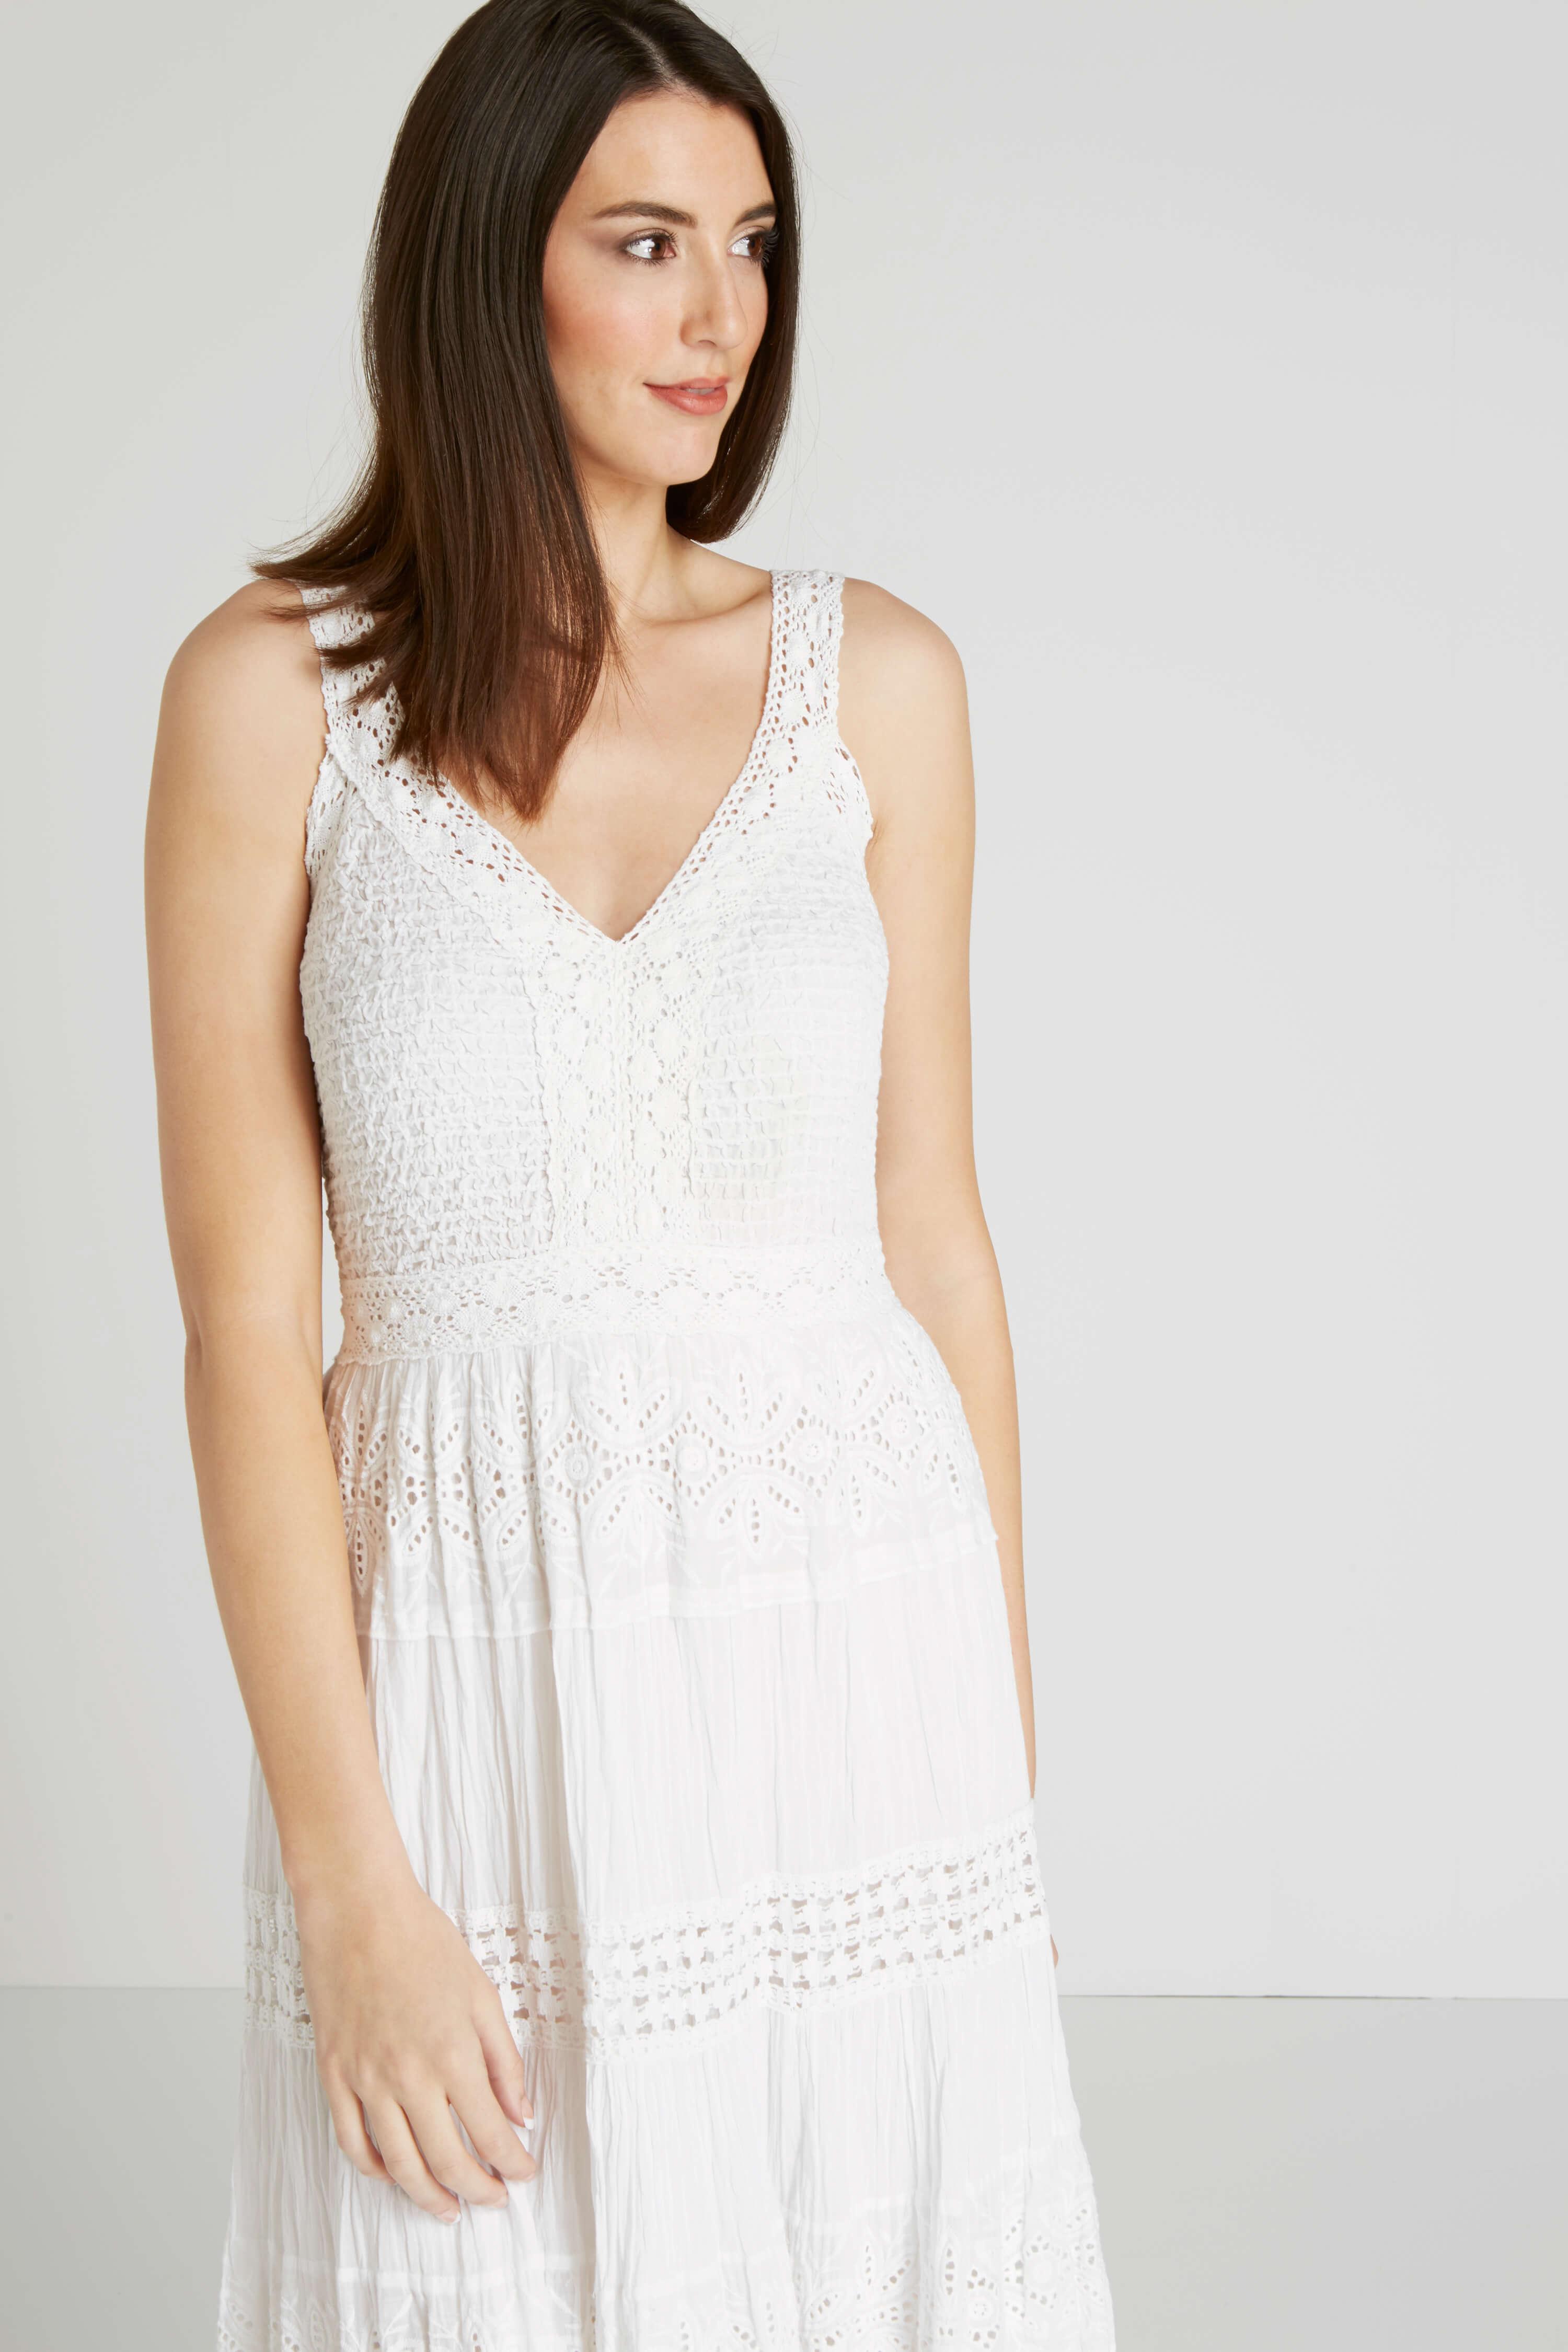 Roman Originals 100% Cotton Summer Maxi Dress in White